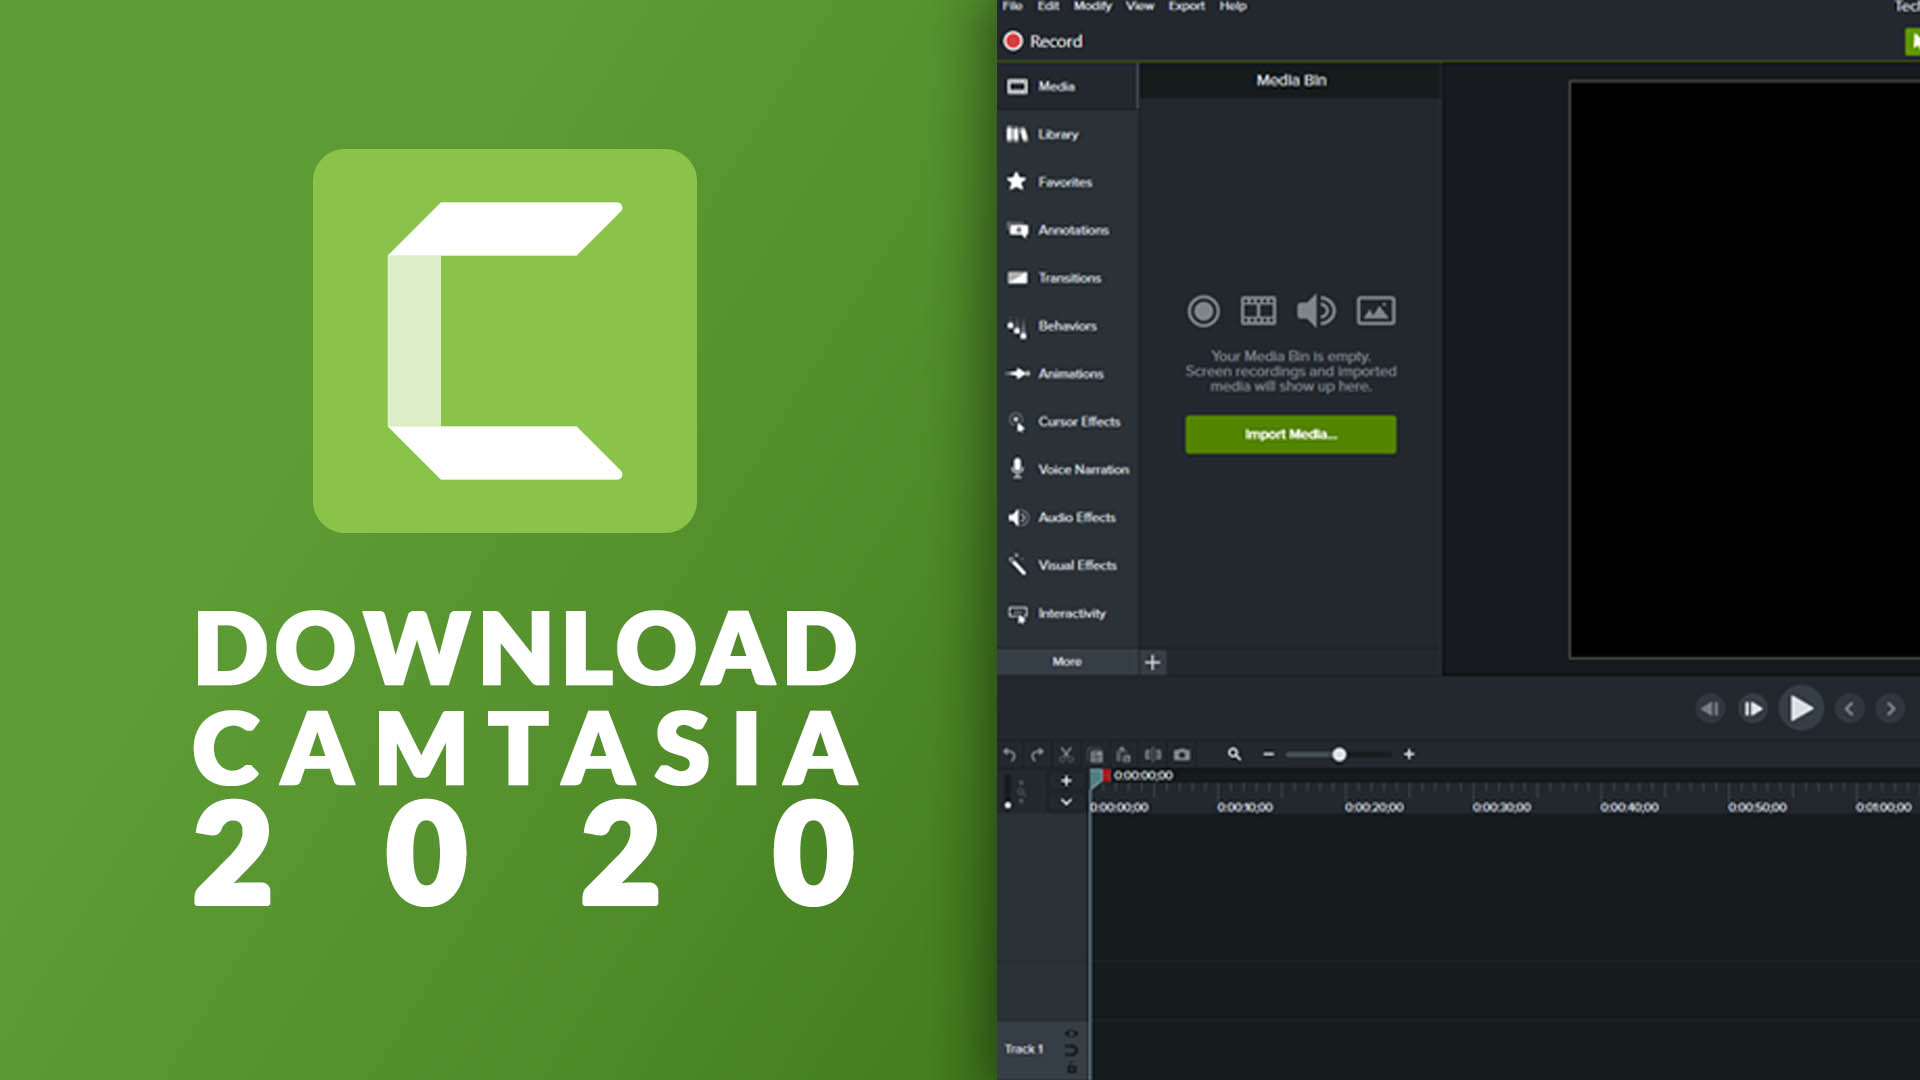 Download Camtasia 2020